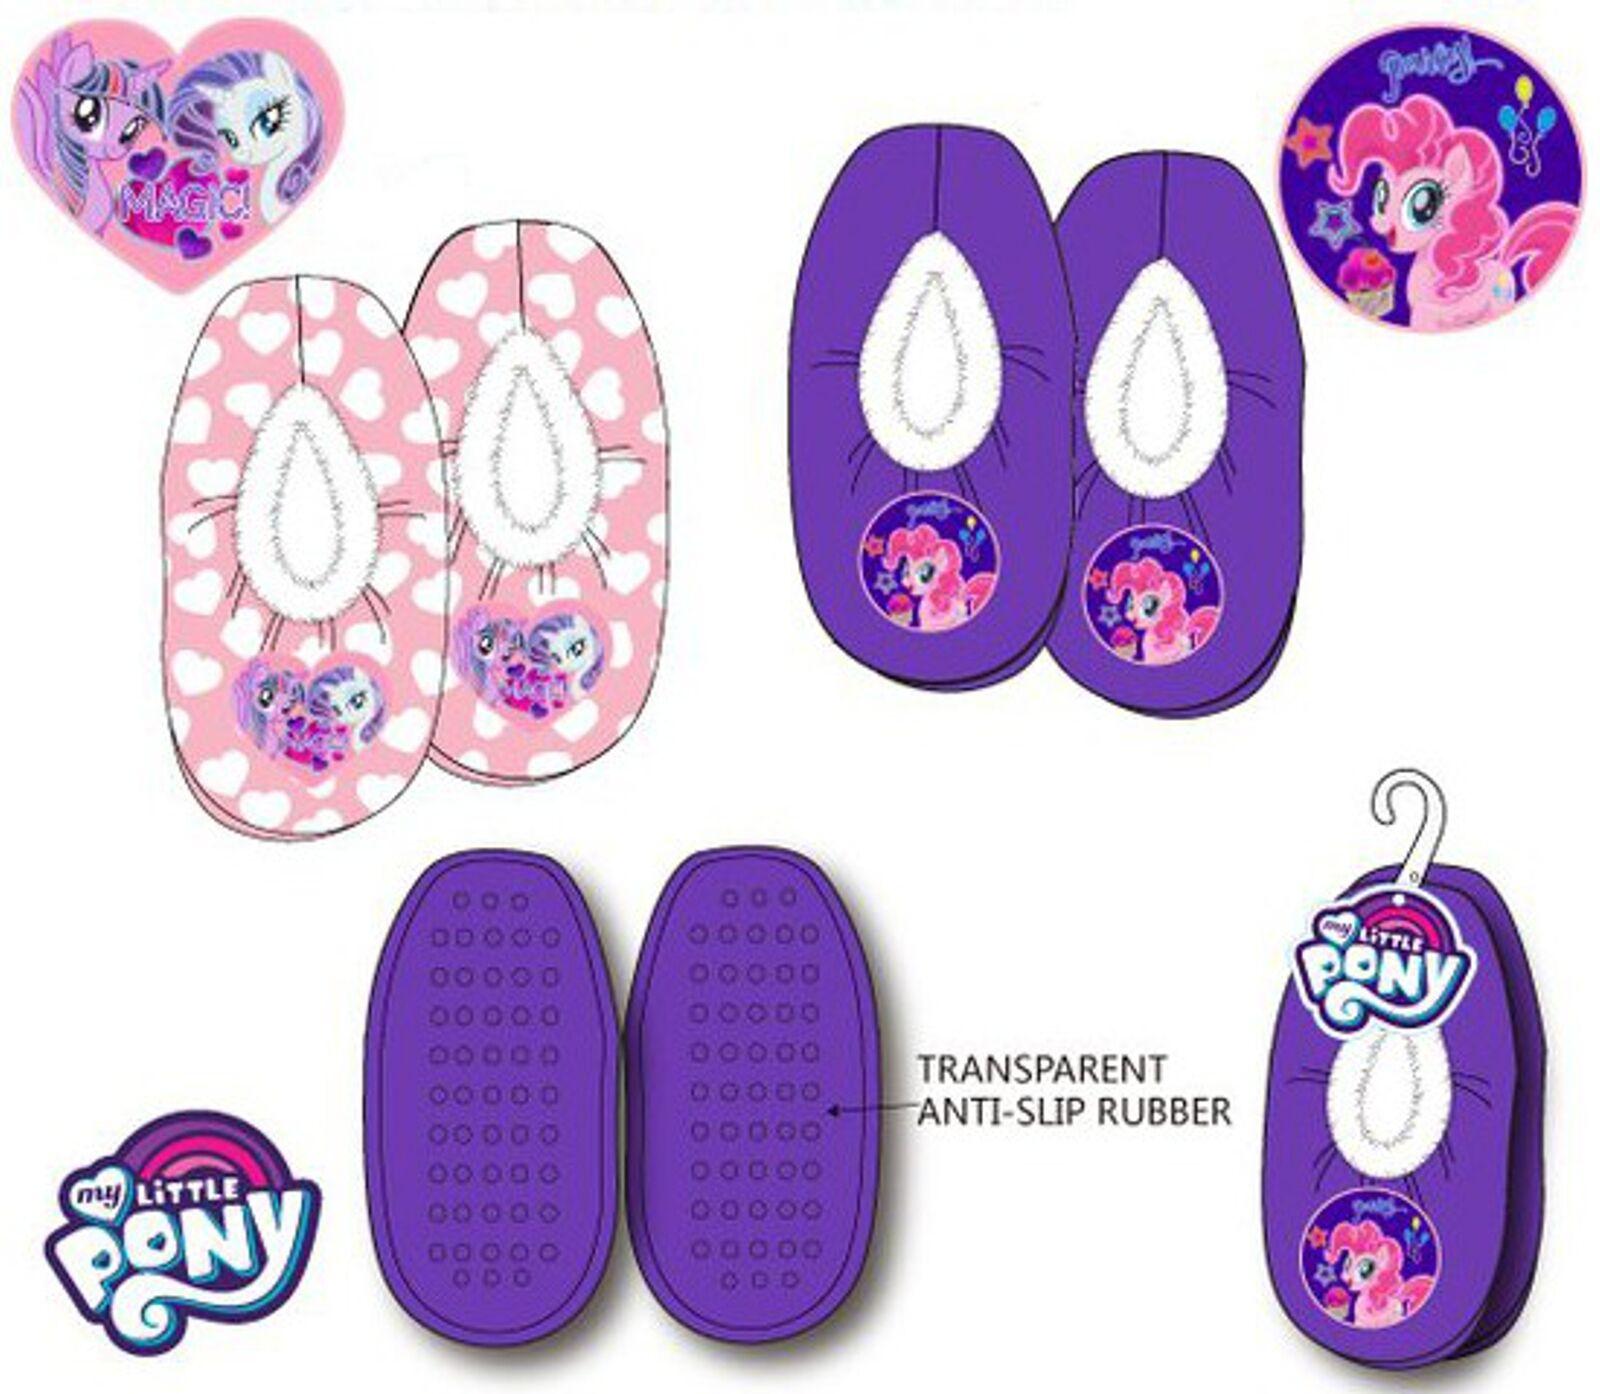 Masha und der Bär Hausschuhe Kinder Mädchen Gr 25-32 Pantoffeln Schuhe neu!